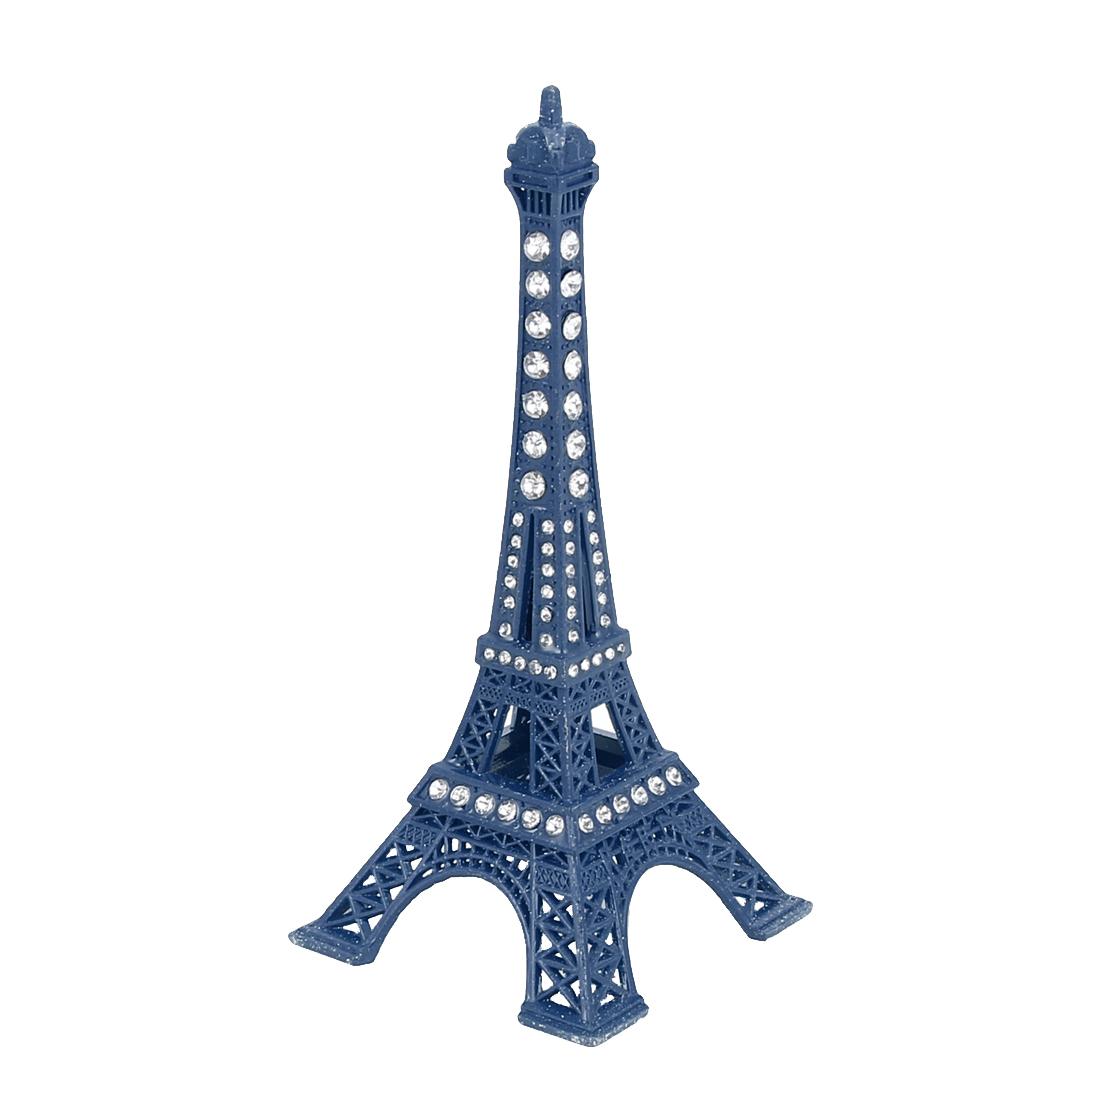 Rhinestone Detail Mini France Paris Eiffel Tower Sculpture Statue Model Ornament 13cm Height Blue